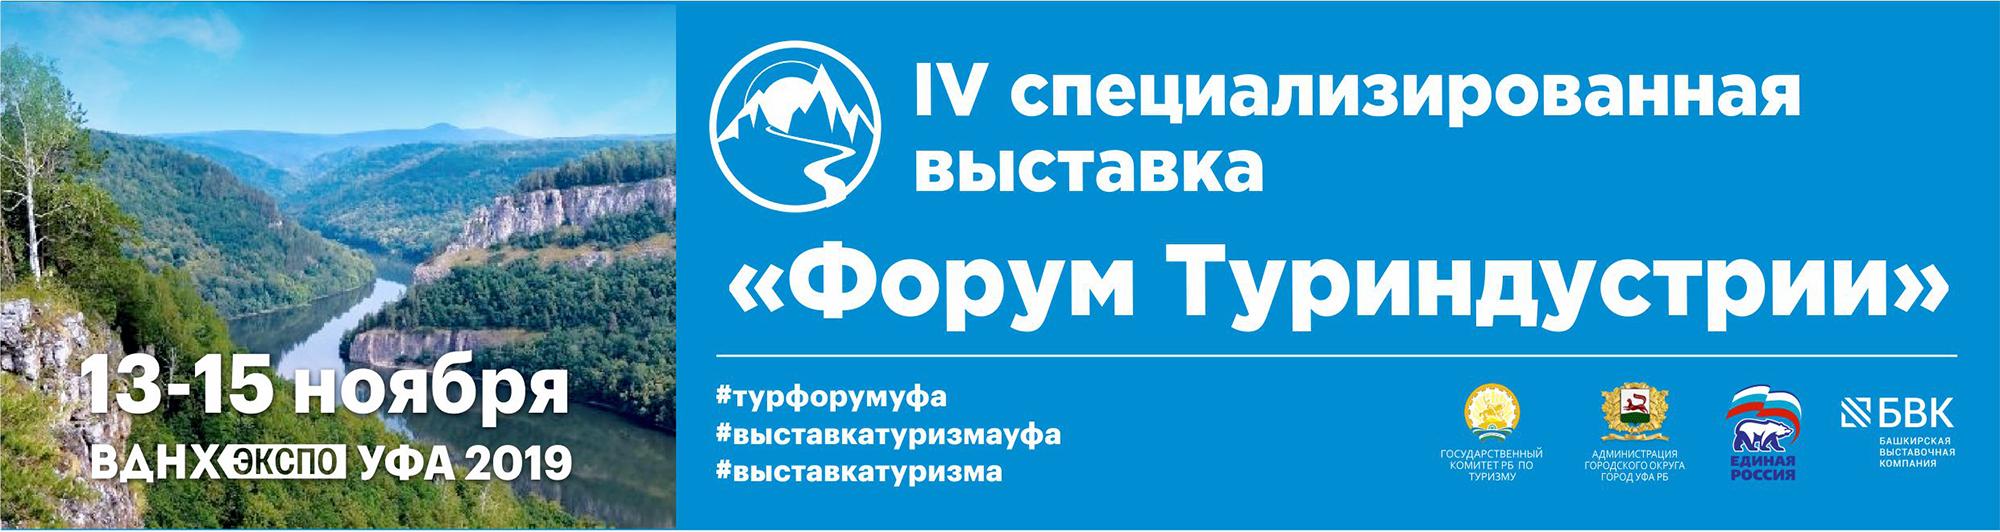 Форум Туриндустрии - 2019